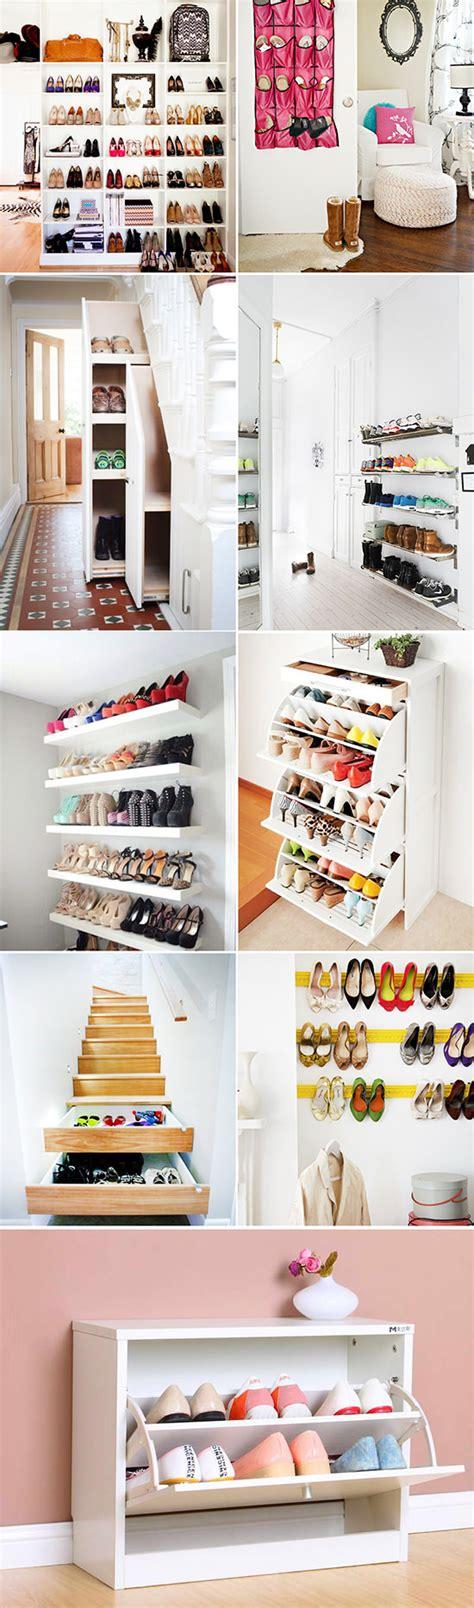 superga porte di catania shoes storage 15 idee ingegnose e creative per tenere in